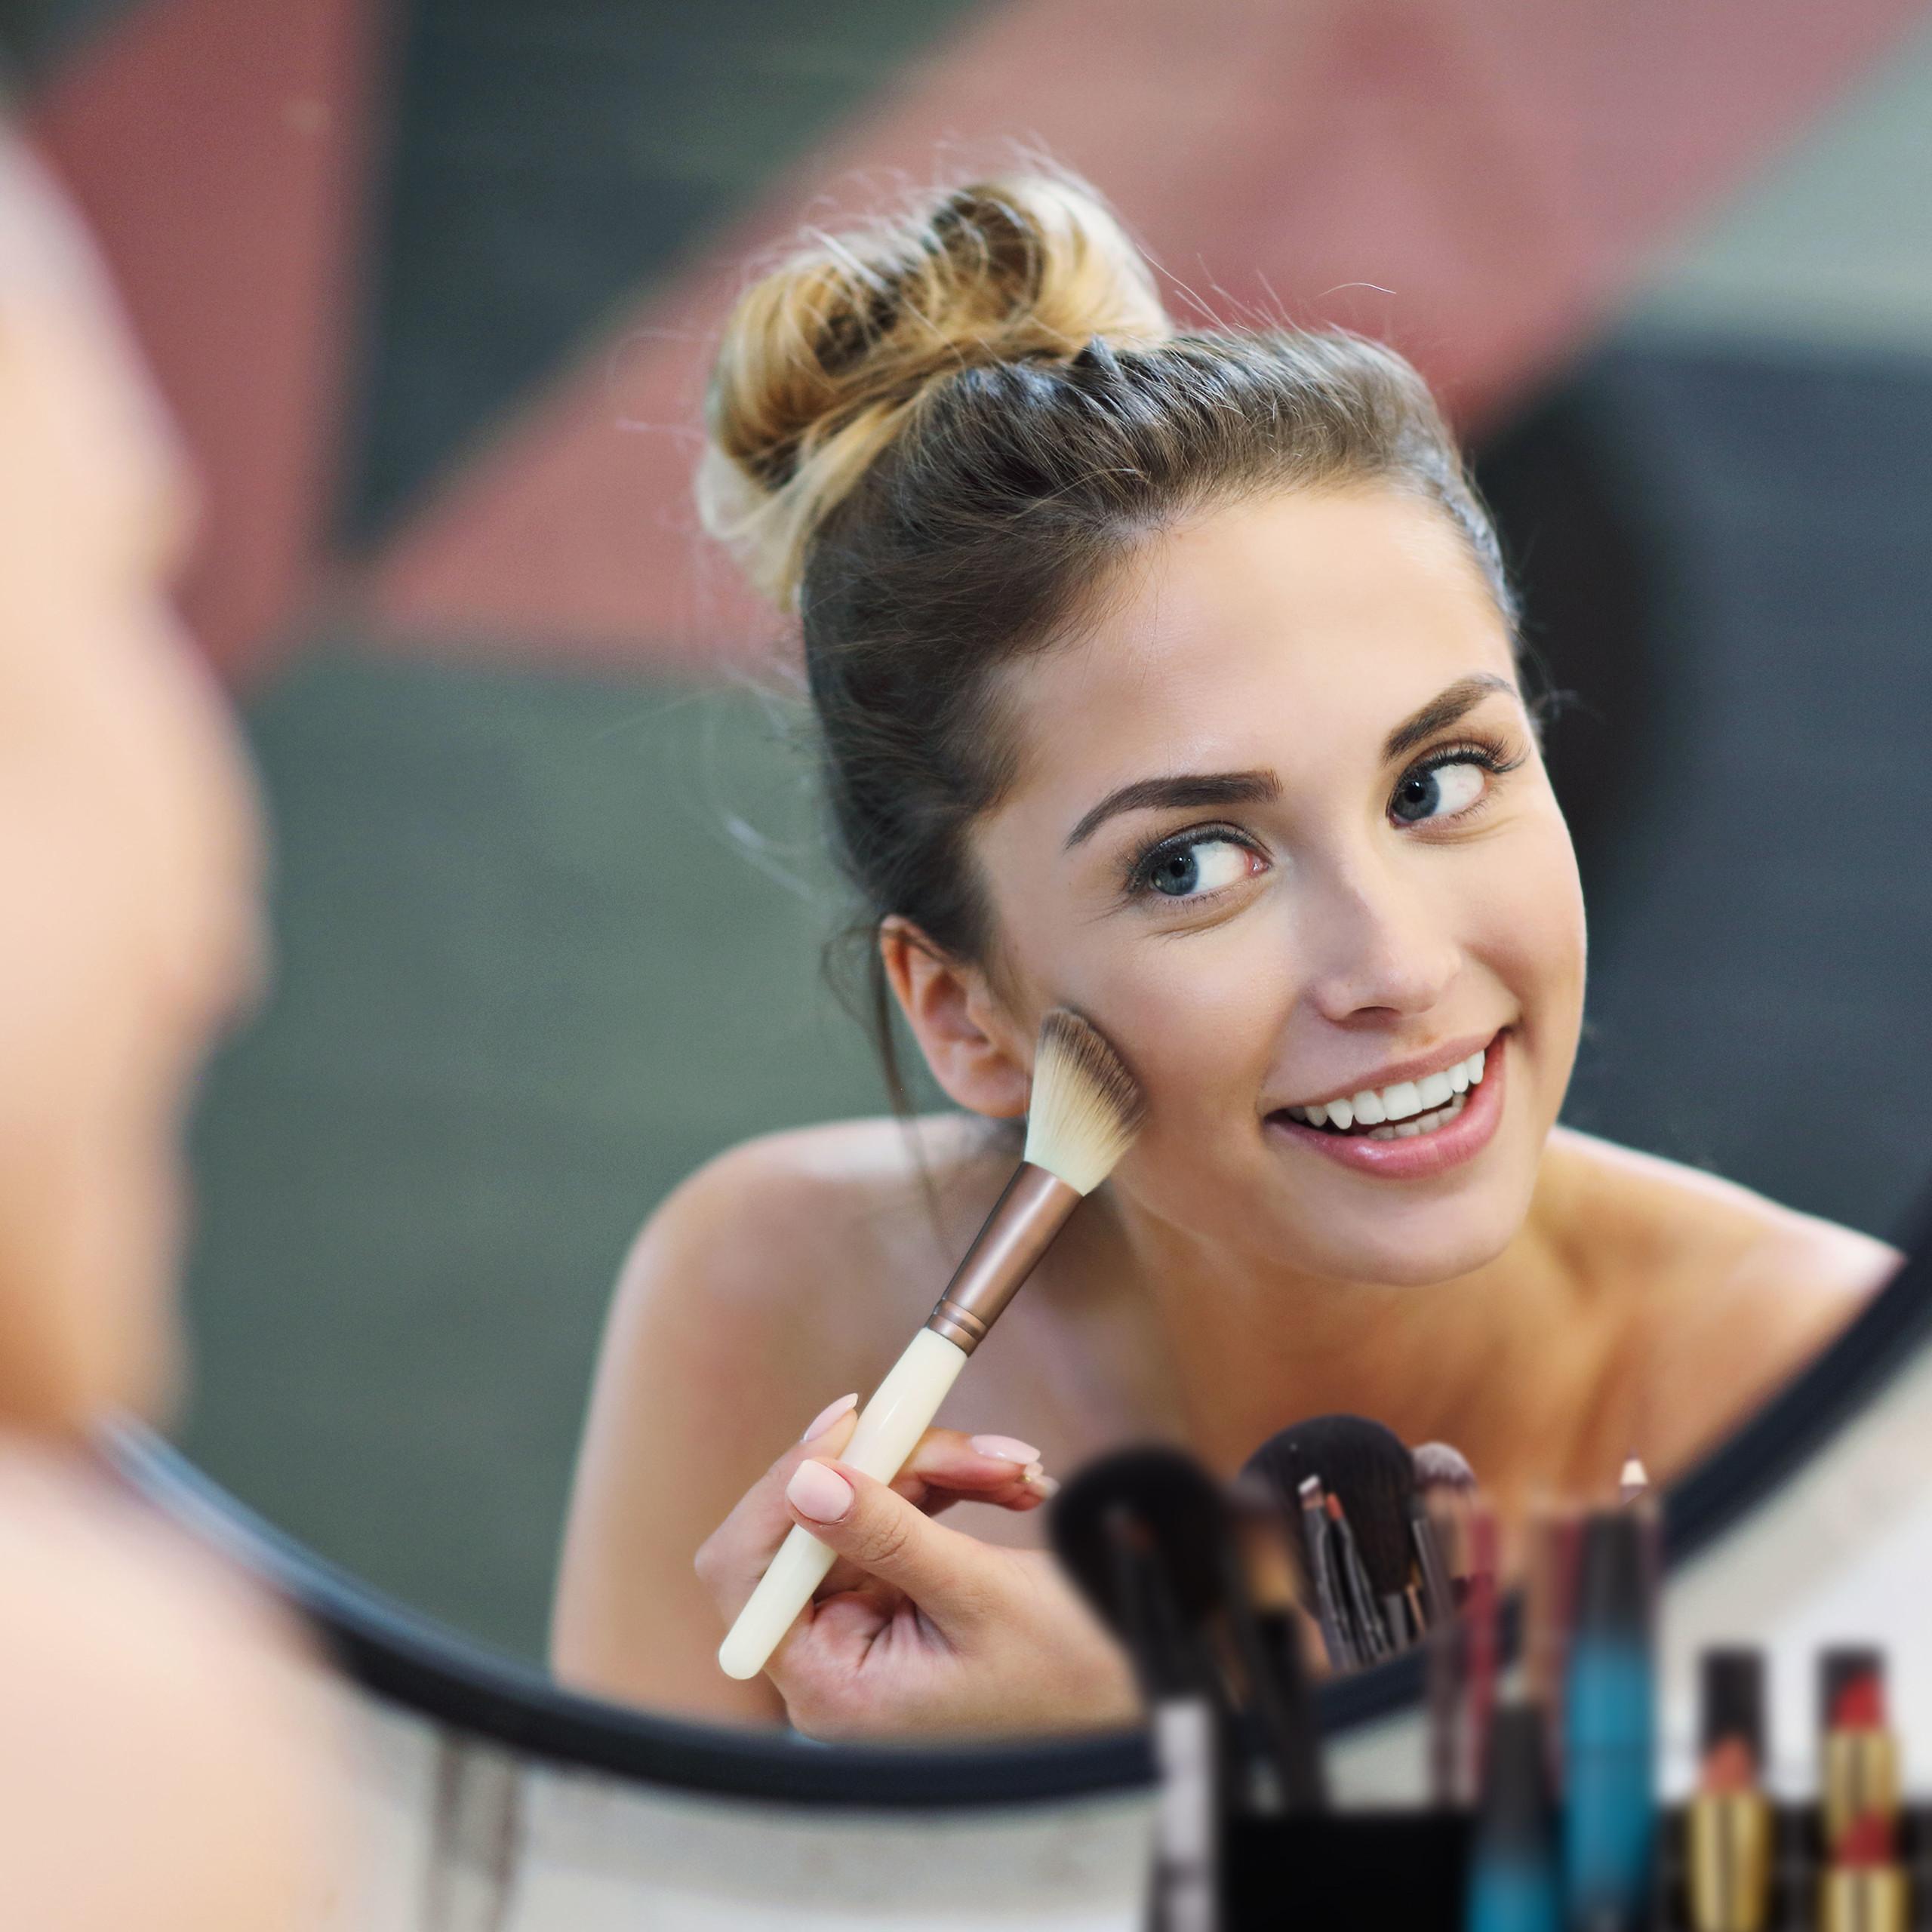 make-up-organizer-met-6-lades-acryl-cosmeticahouder-make-up-cosmetica-opslag miniatuur 15